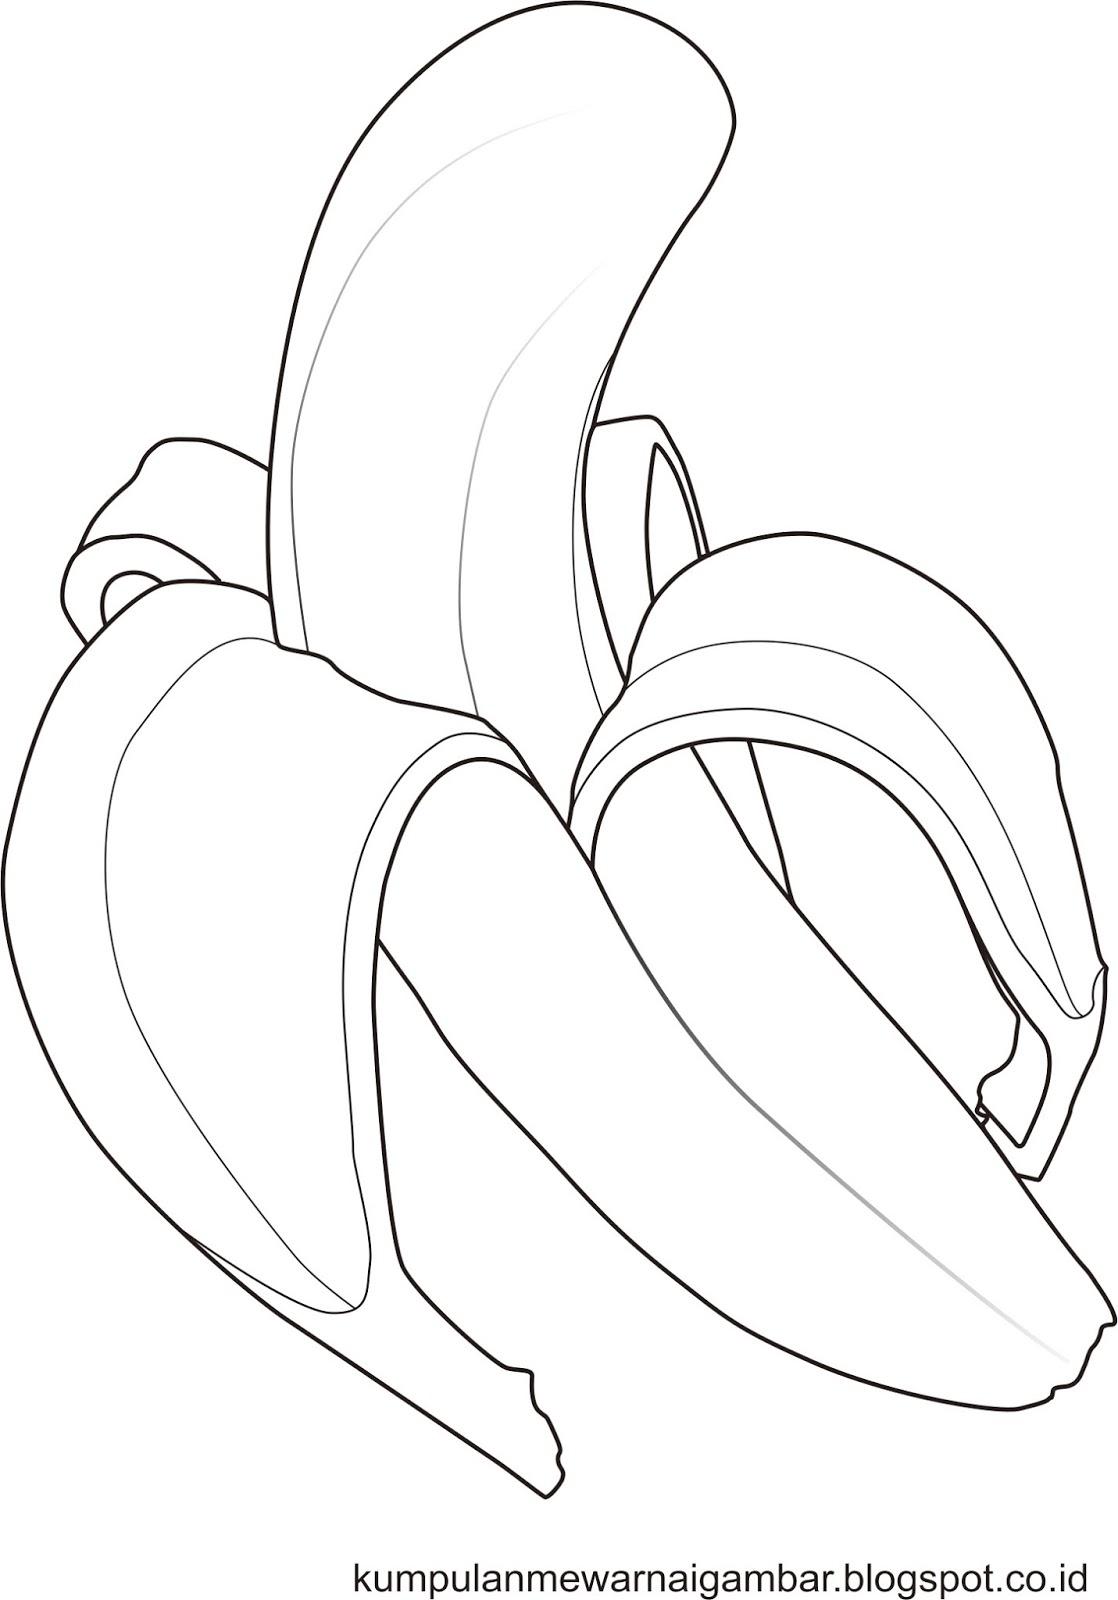 hewan binatang [darat air] buah sayuran tumbuhan bunga benda obyek tempat bermain dll Semoga dapat membantu anda untuk latihan mewarnai atau